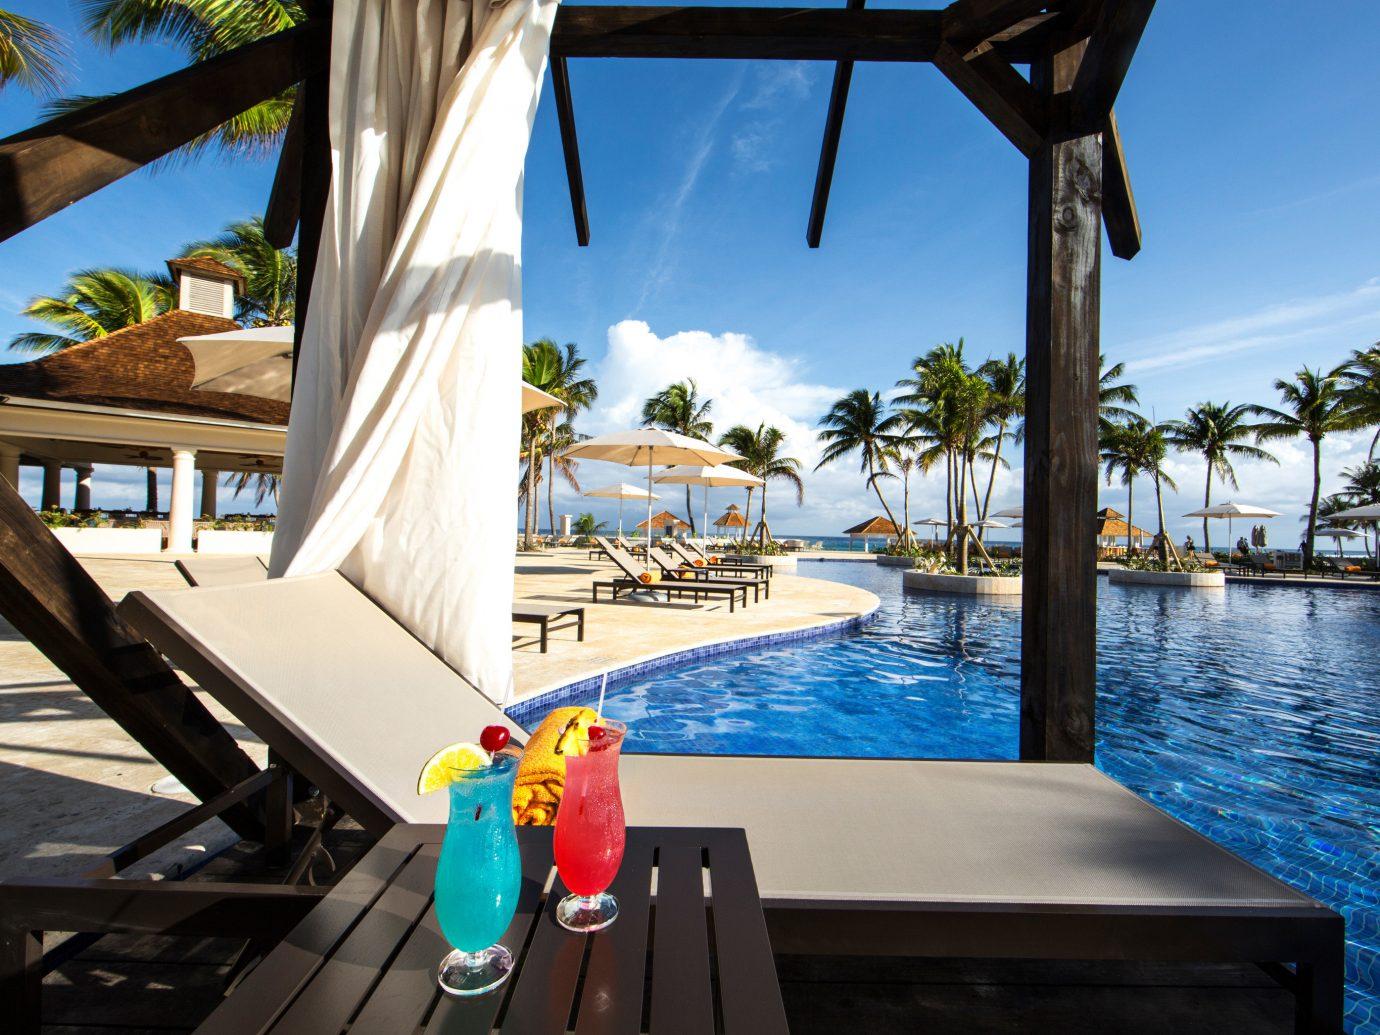 Hotels sky table leisure vacation Resort swimming pool Ocean estate caribbean wooden Sea Beach Villa overlooking